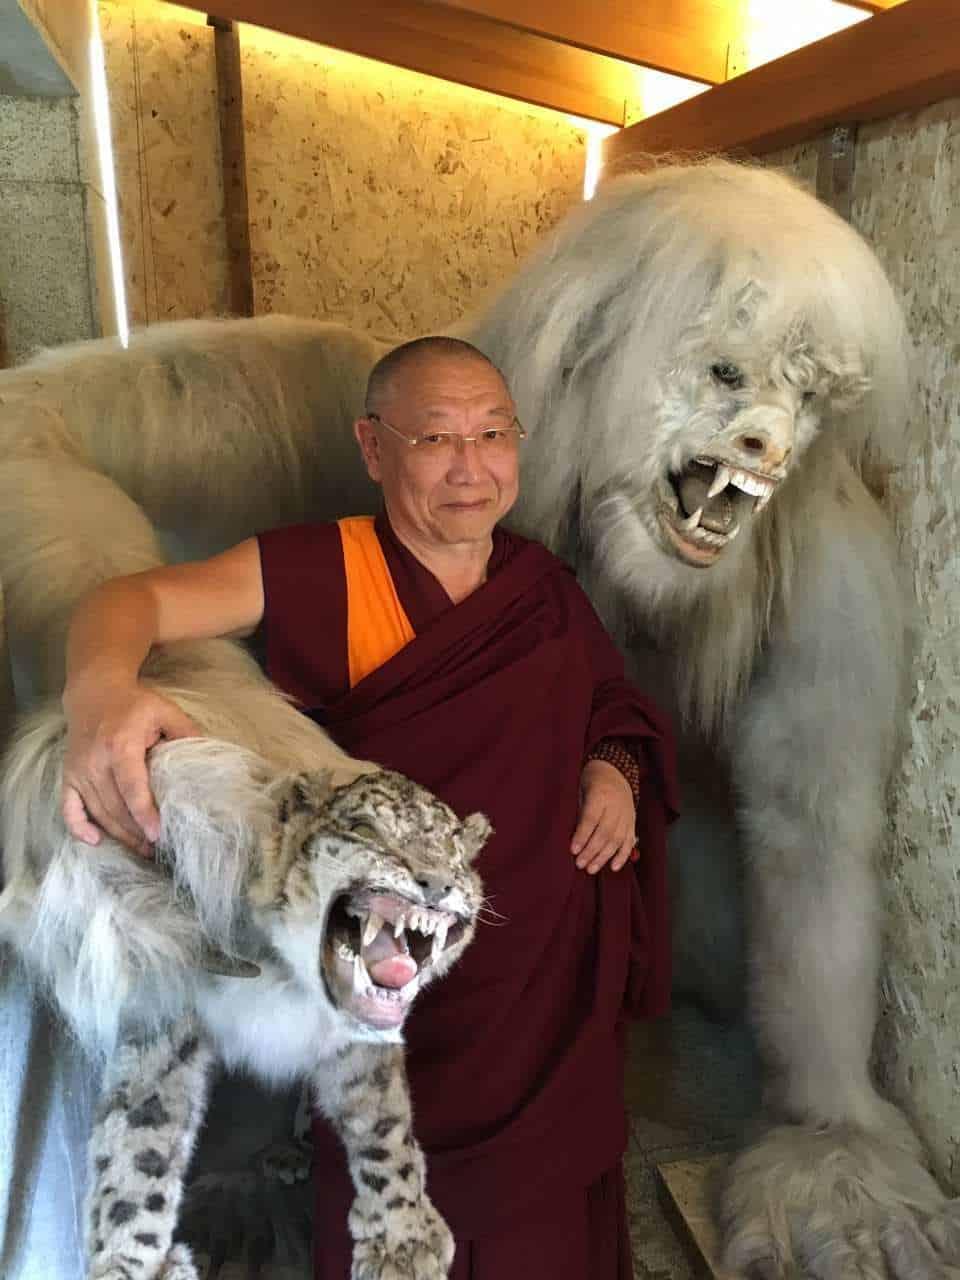 gosok-rinpoche-mongolia-2016-6c7104f9f60dc16fb42d627a89c2ccd